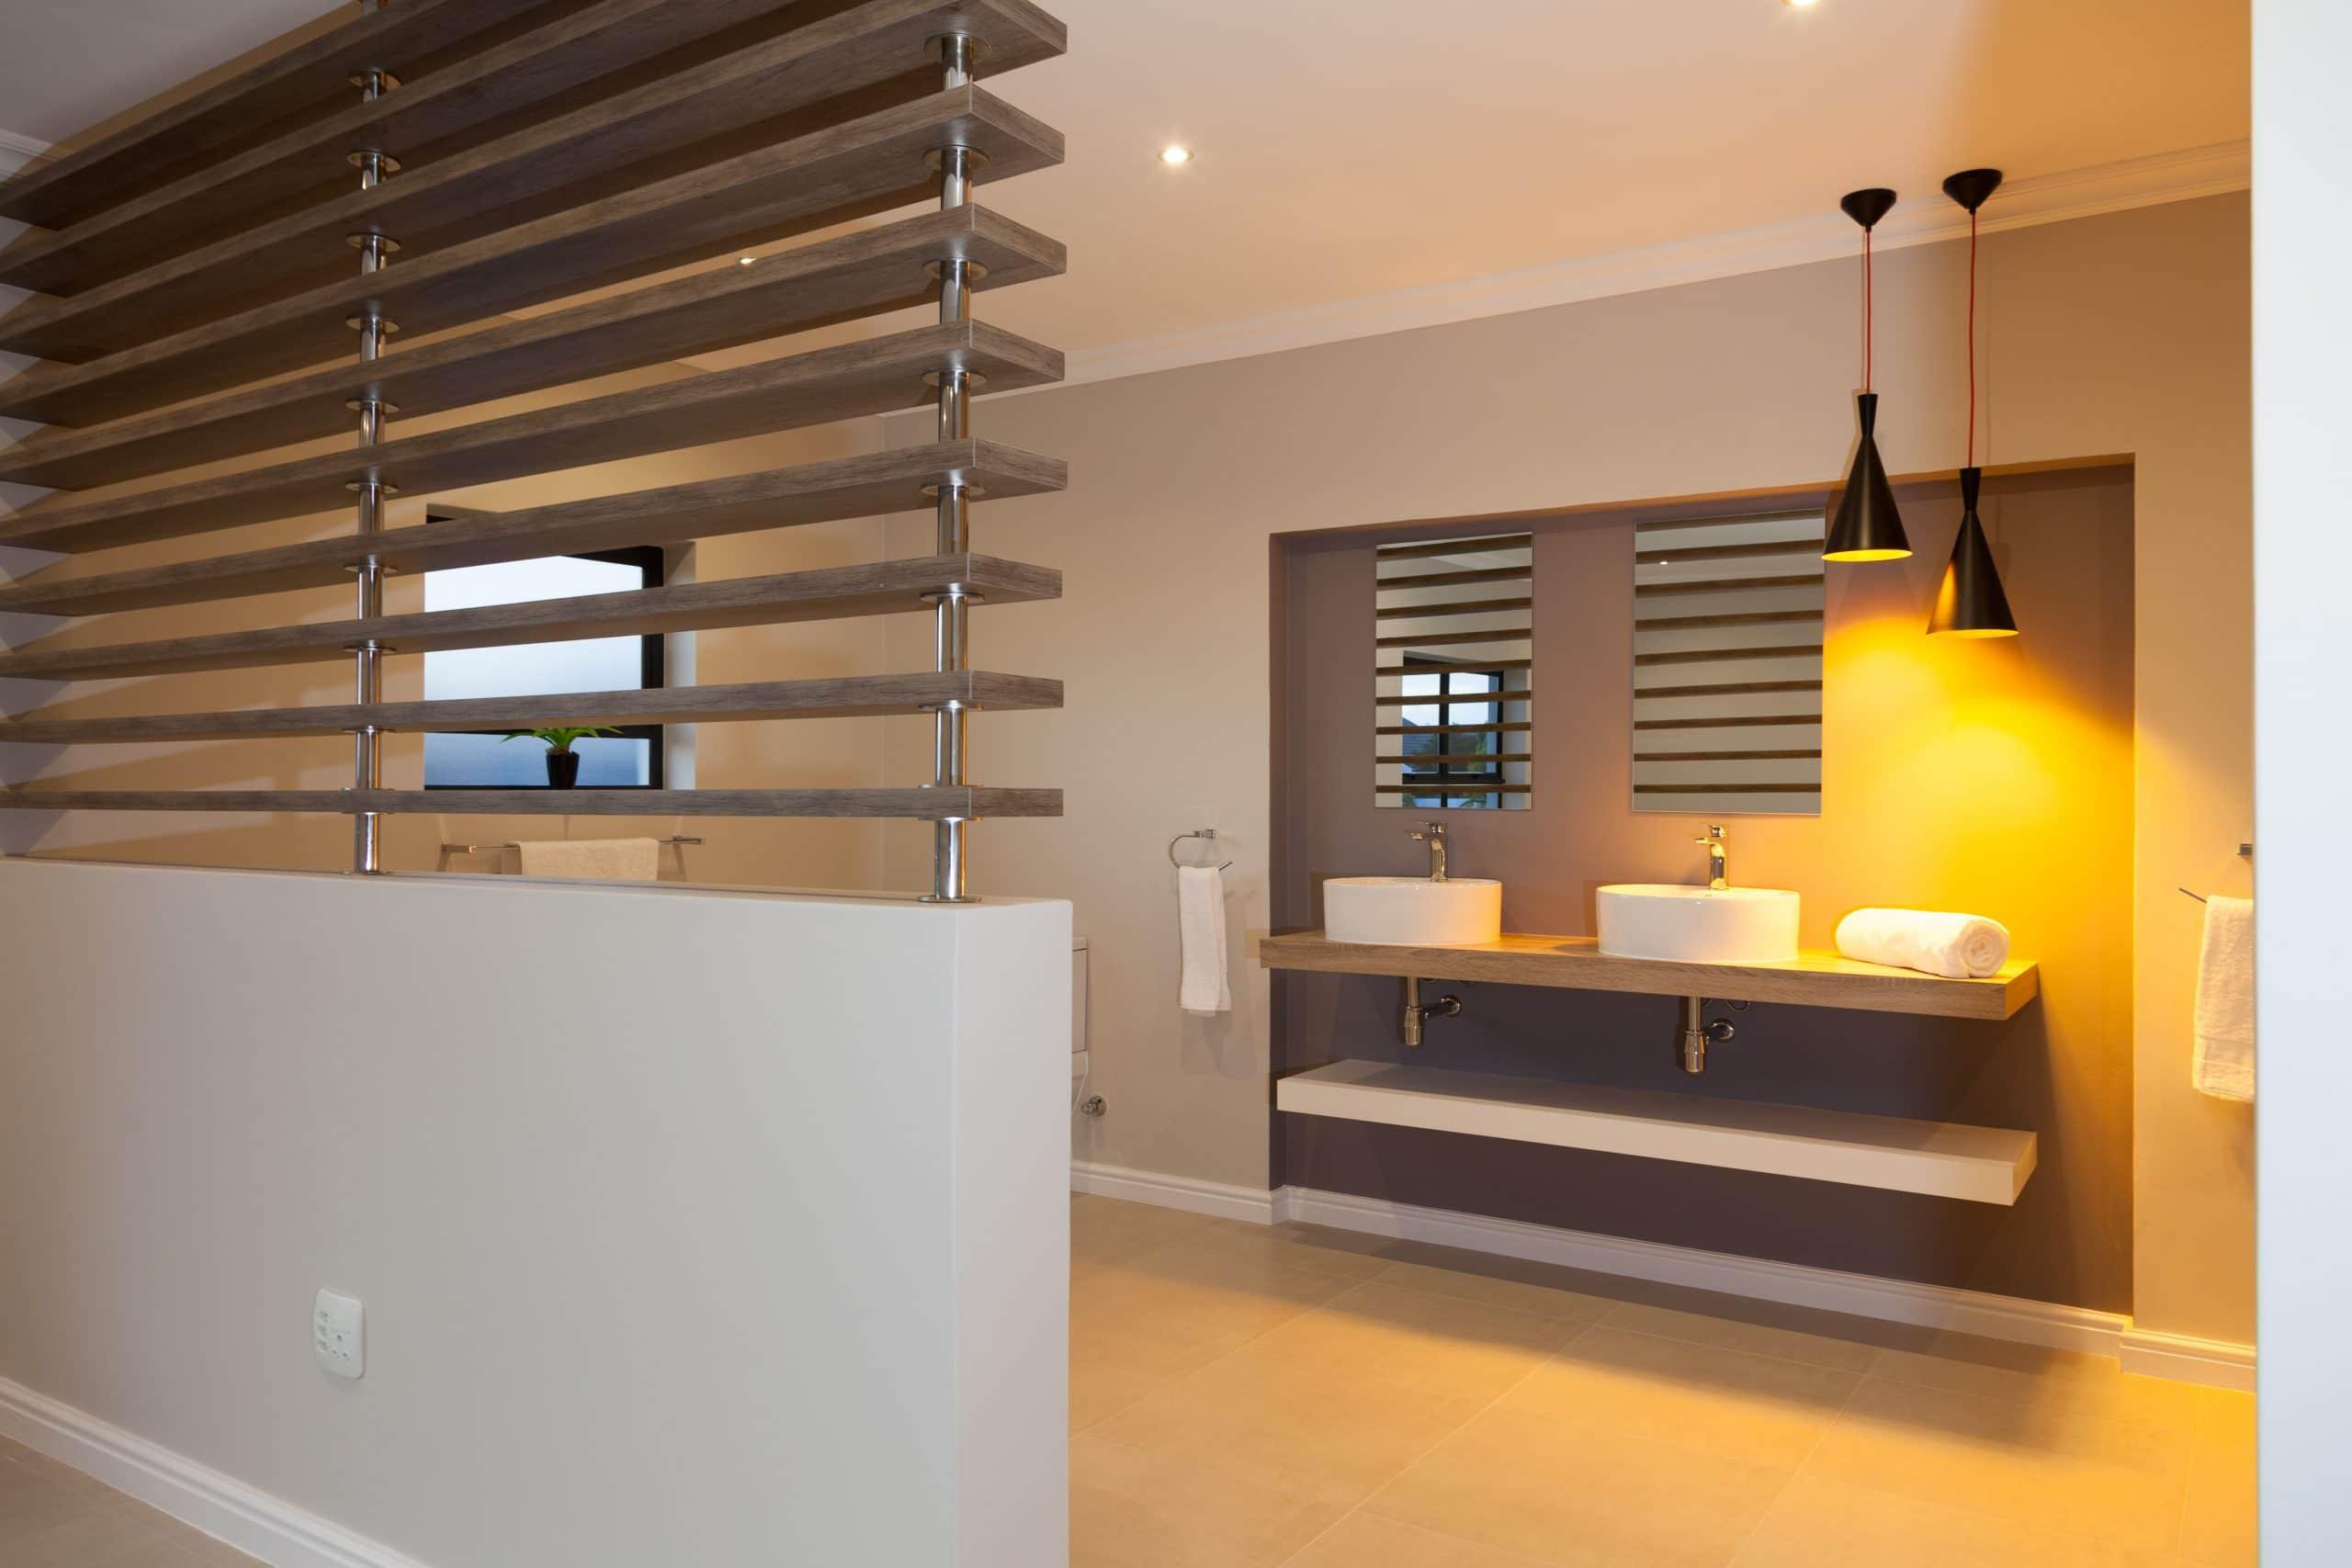 wooden slats modern bedroom bathroom black yellow light pendants